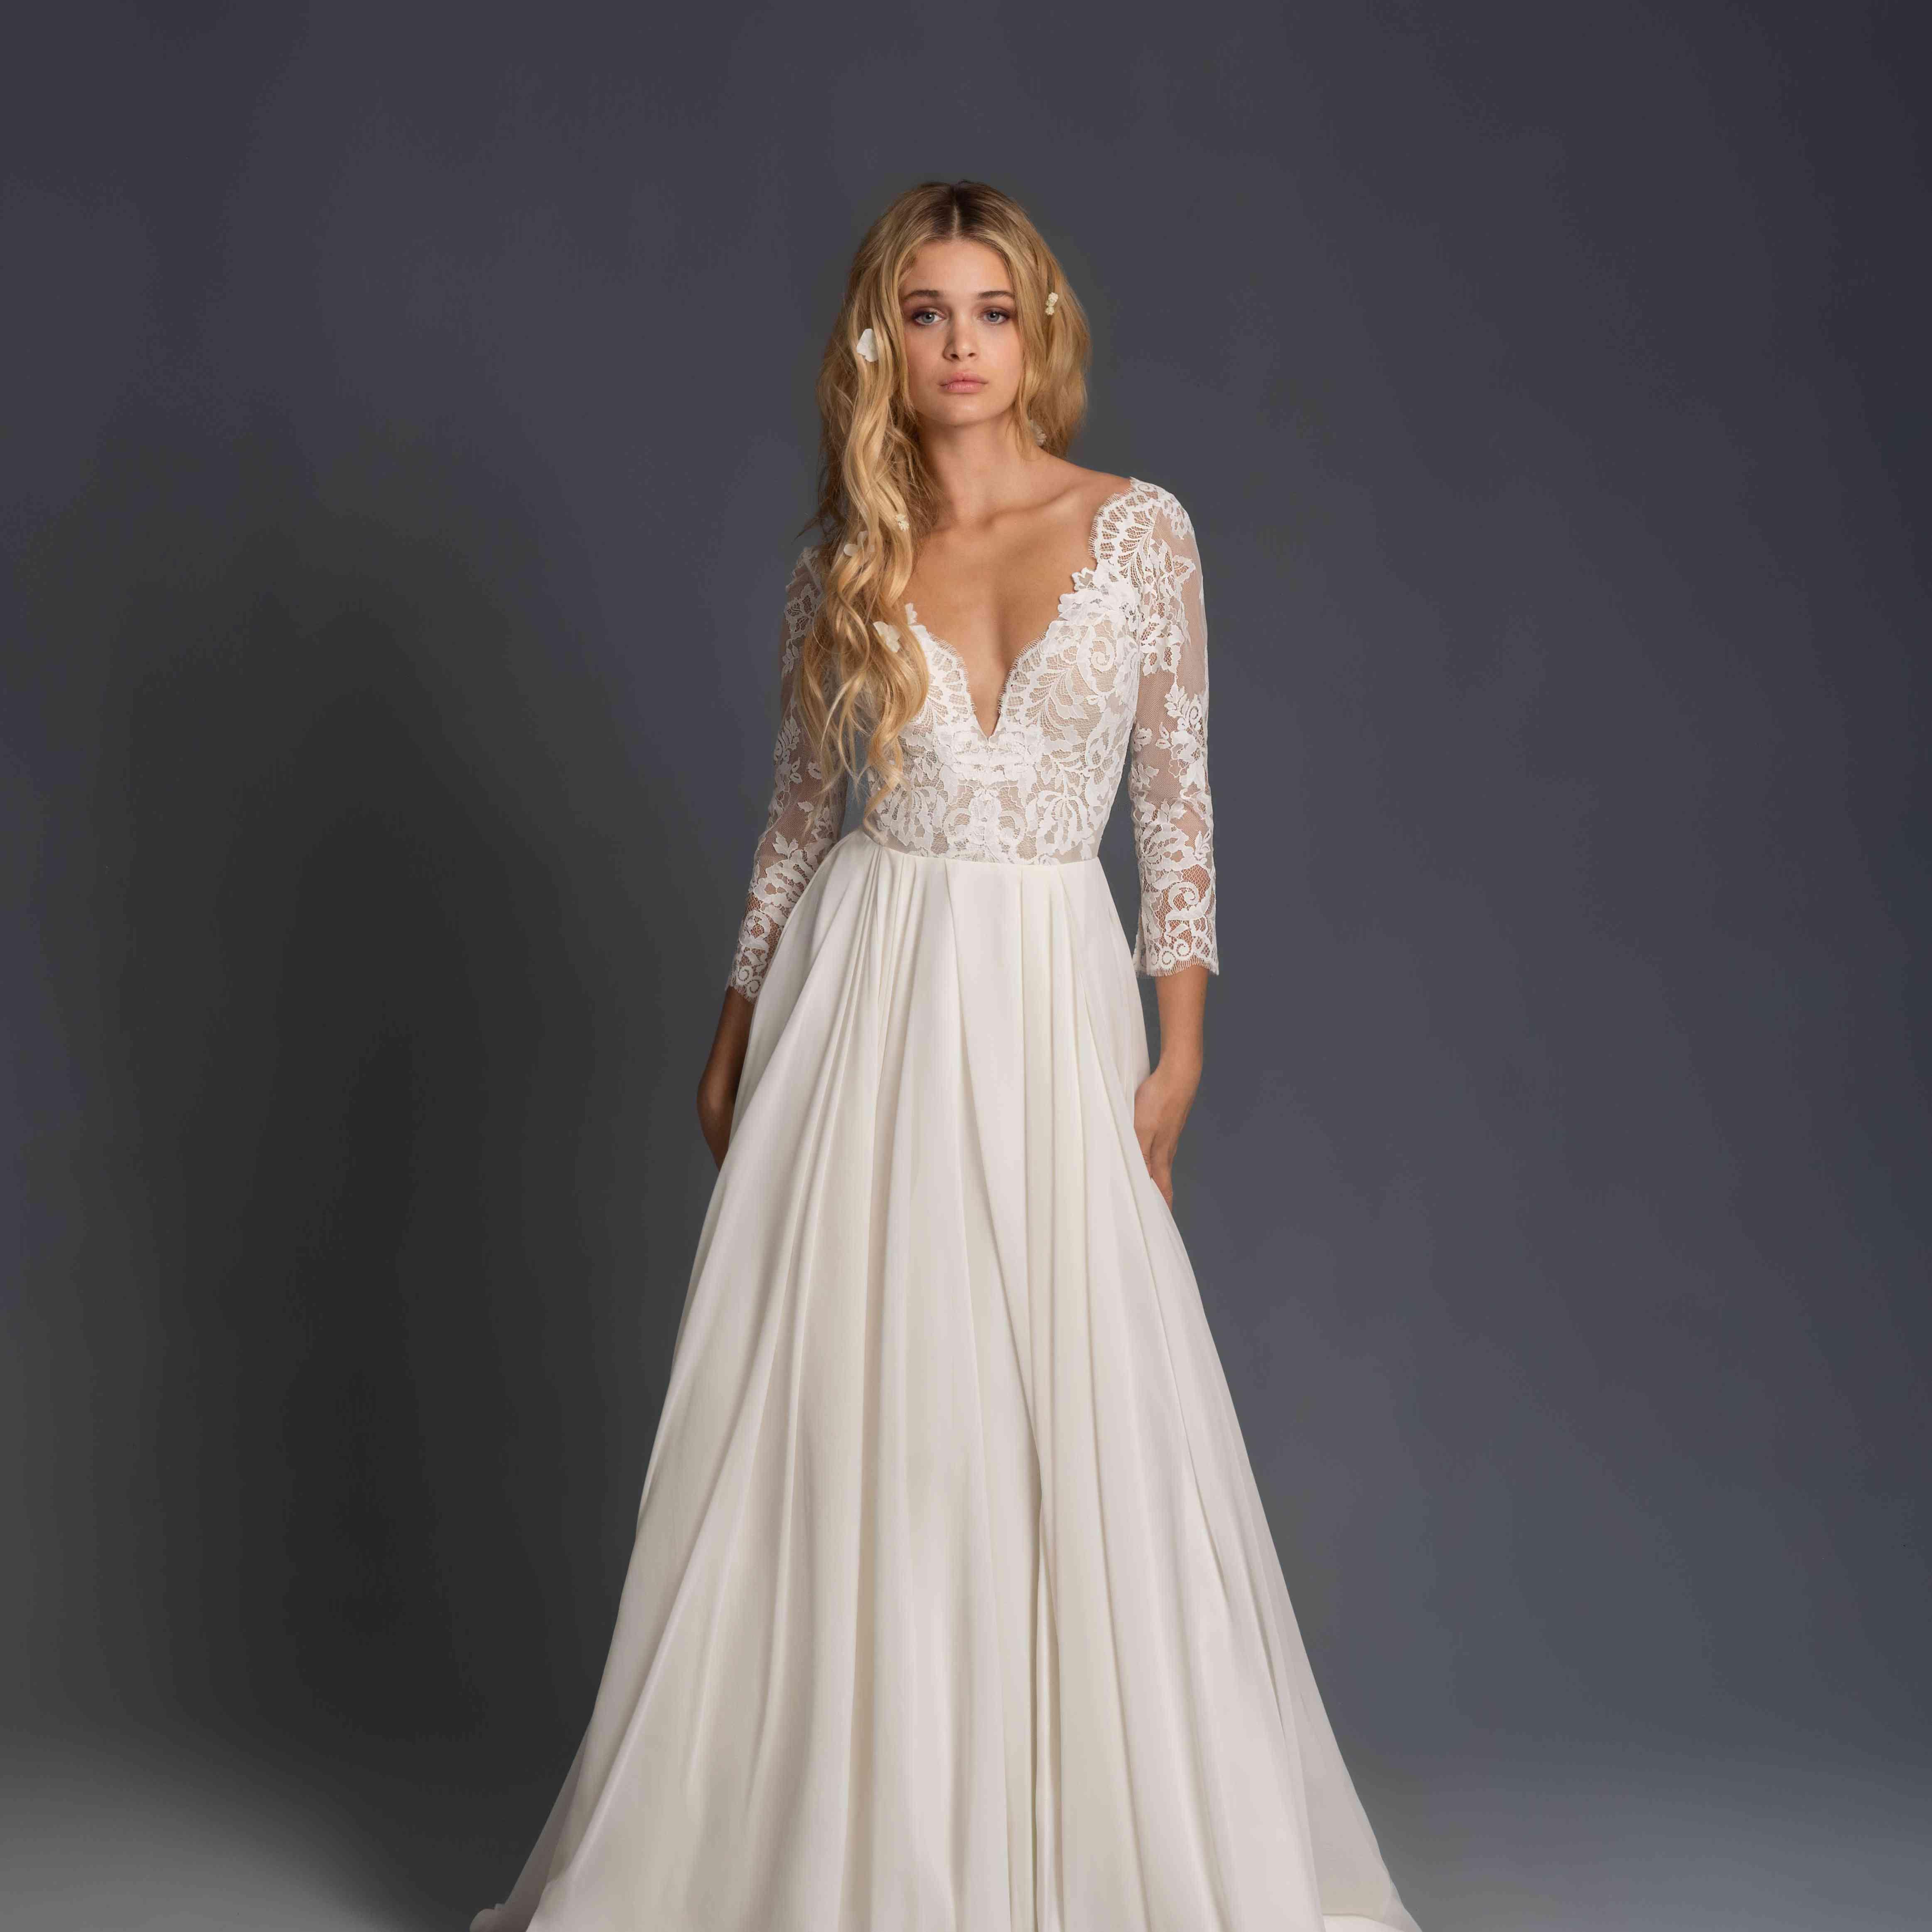 Model in long sleeve plunging wedding dress